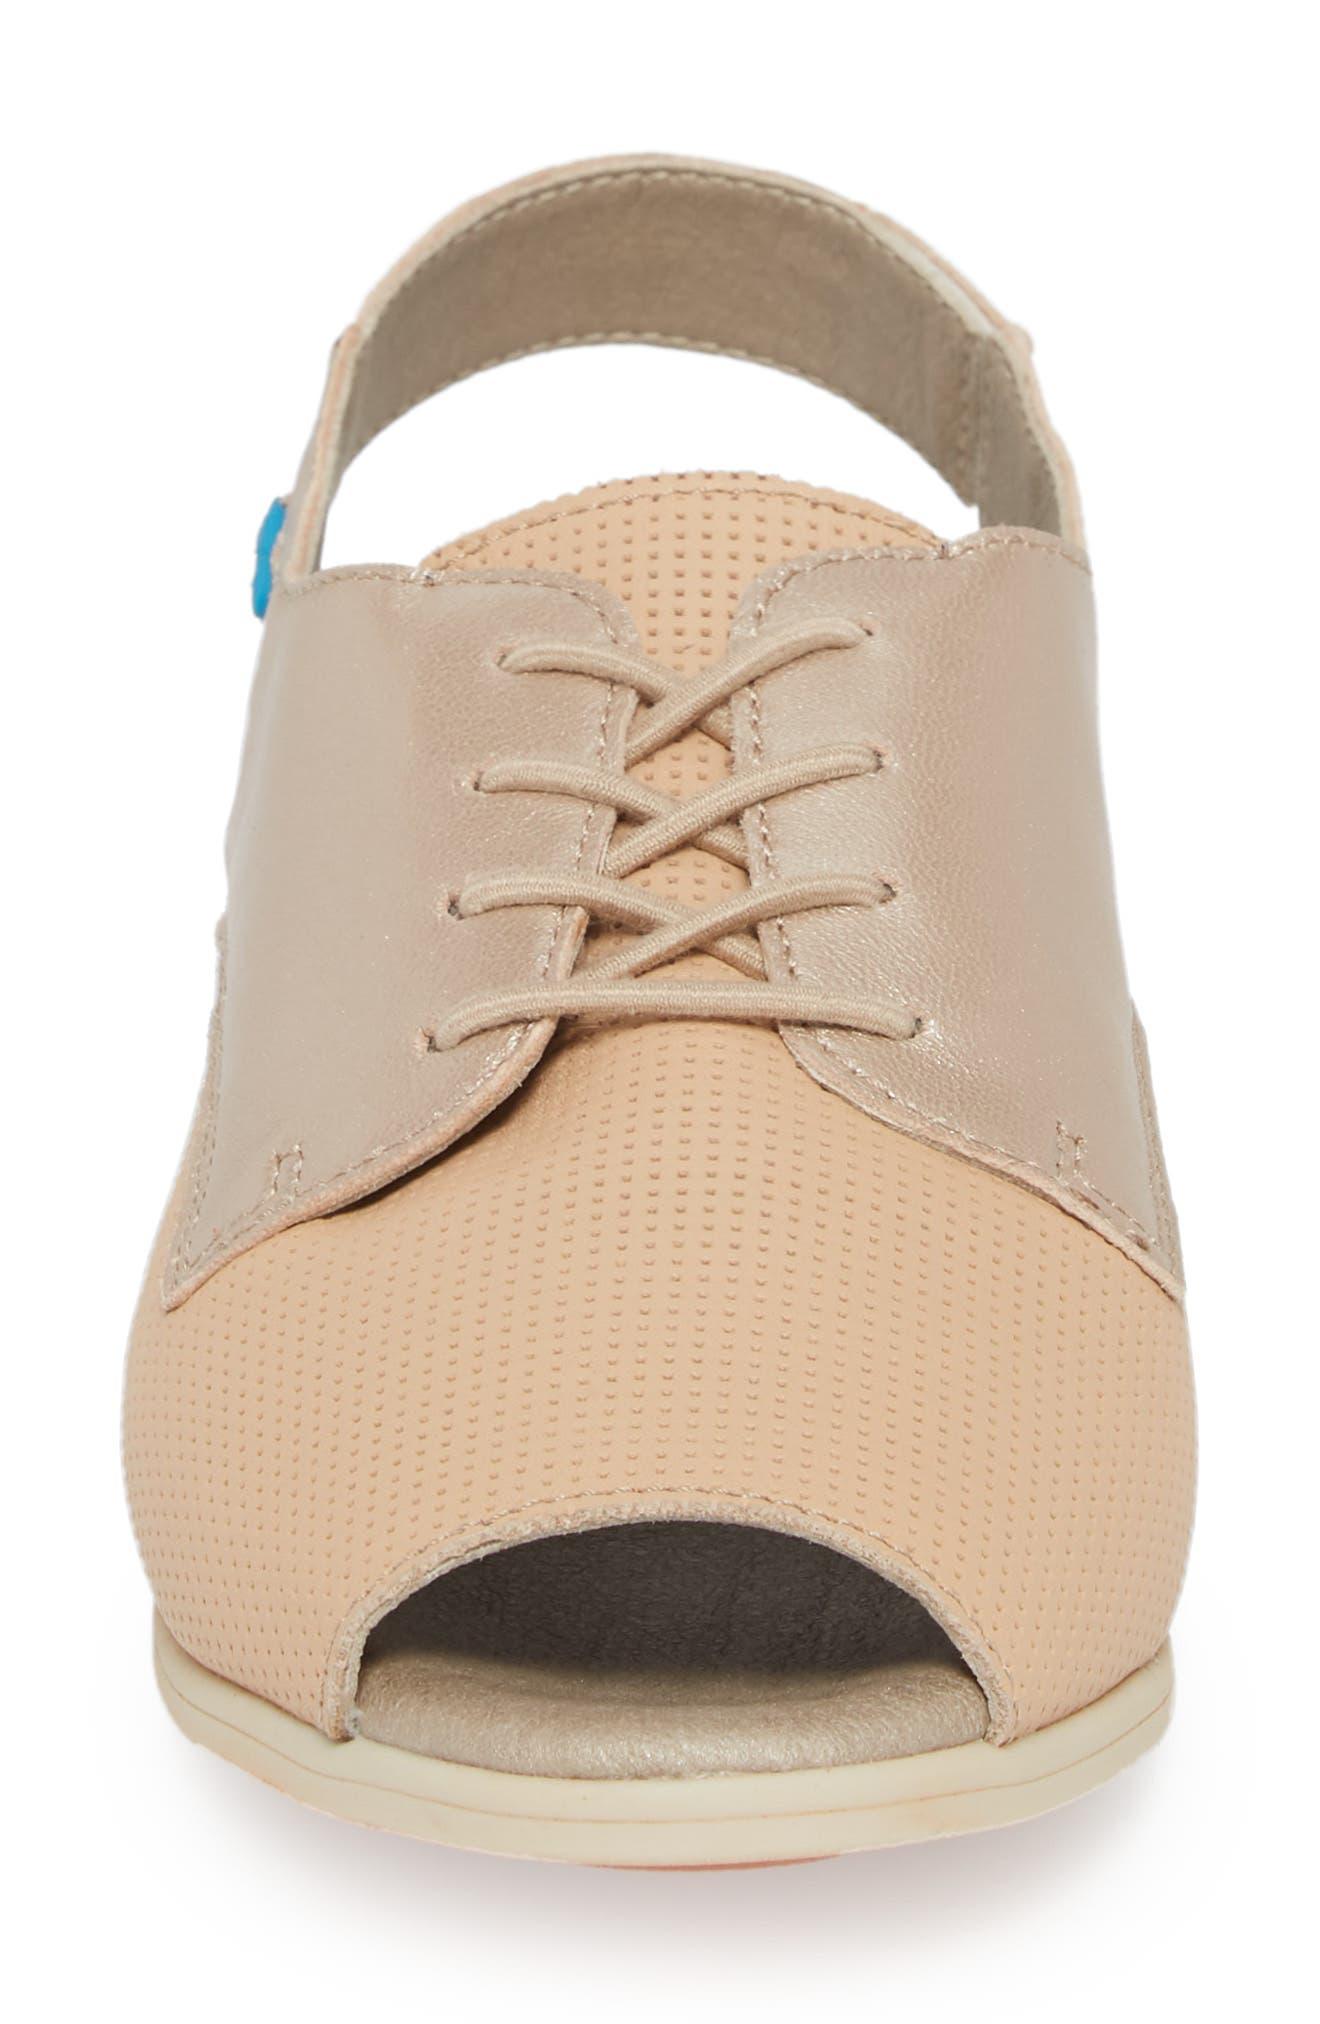 Cleone Slingback Sandal,                             Alternate thumbnail 4, color,                             Puima Sabbia Leather